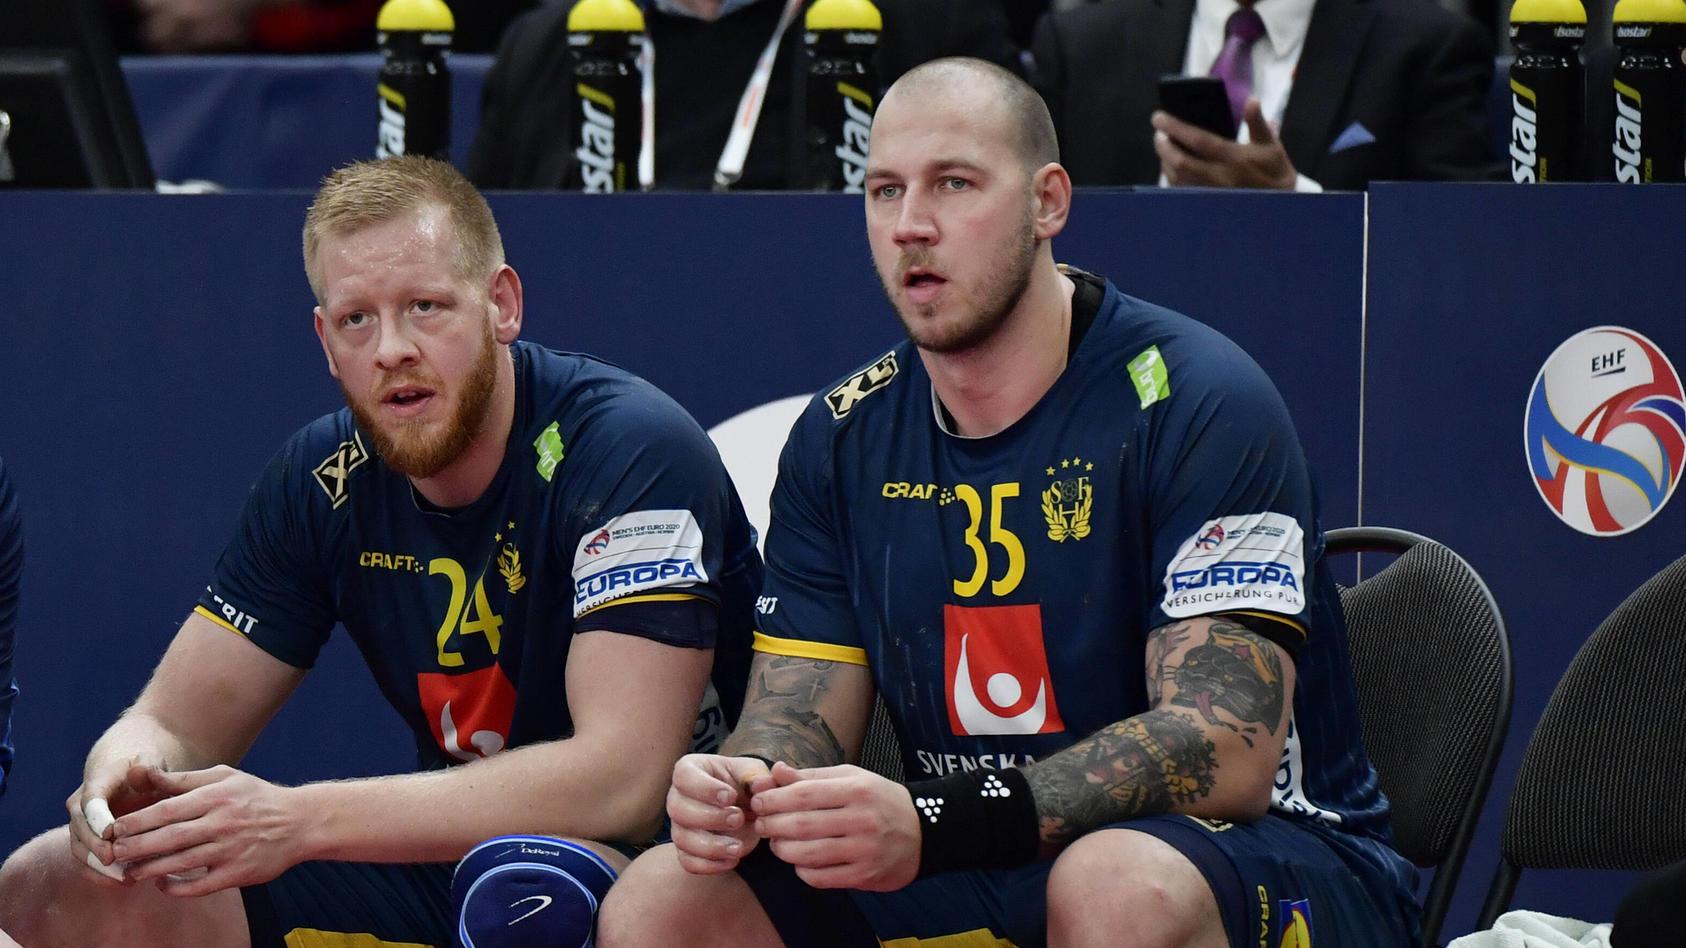 Schweden handballer Jim Gottfridsson